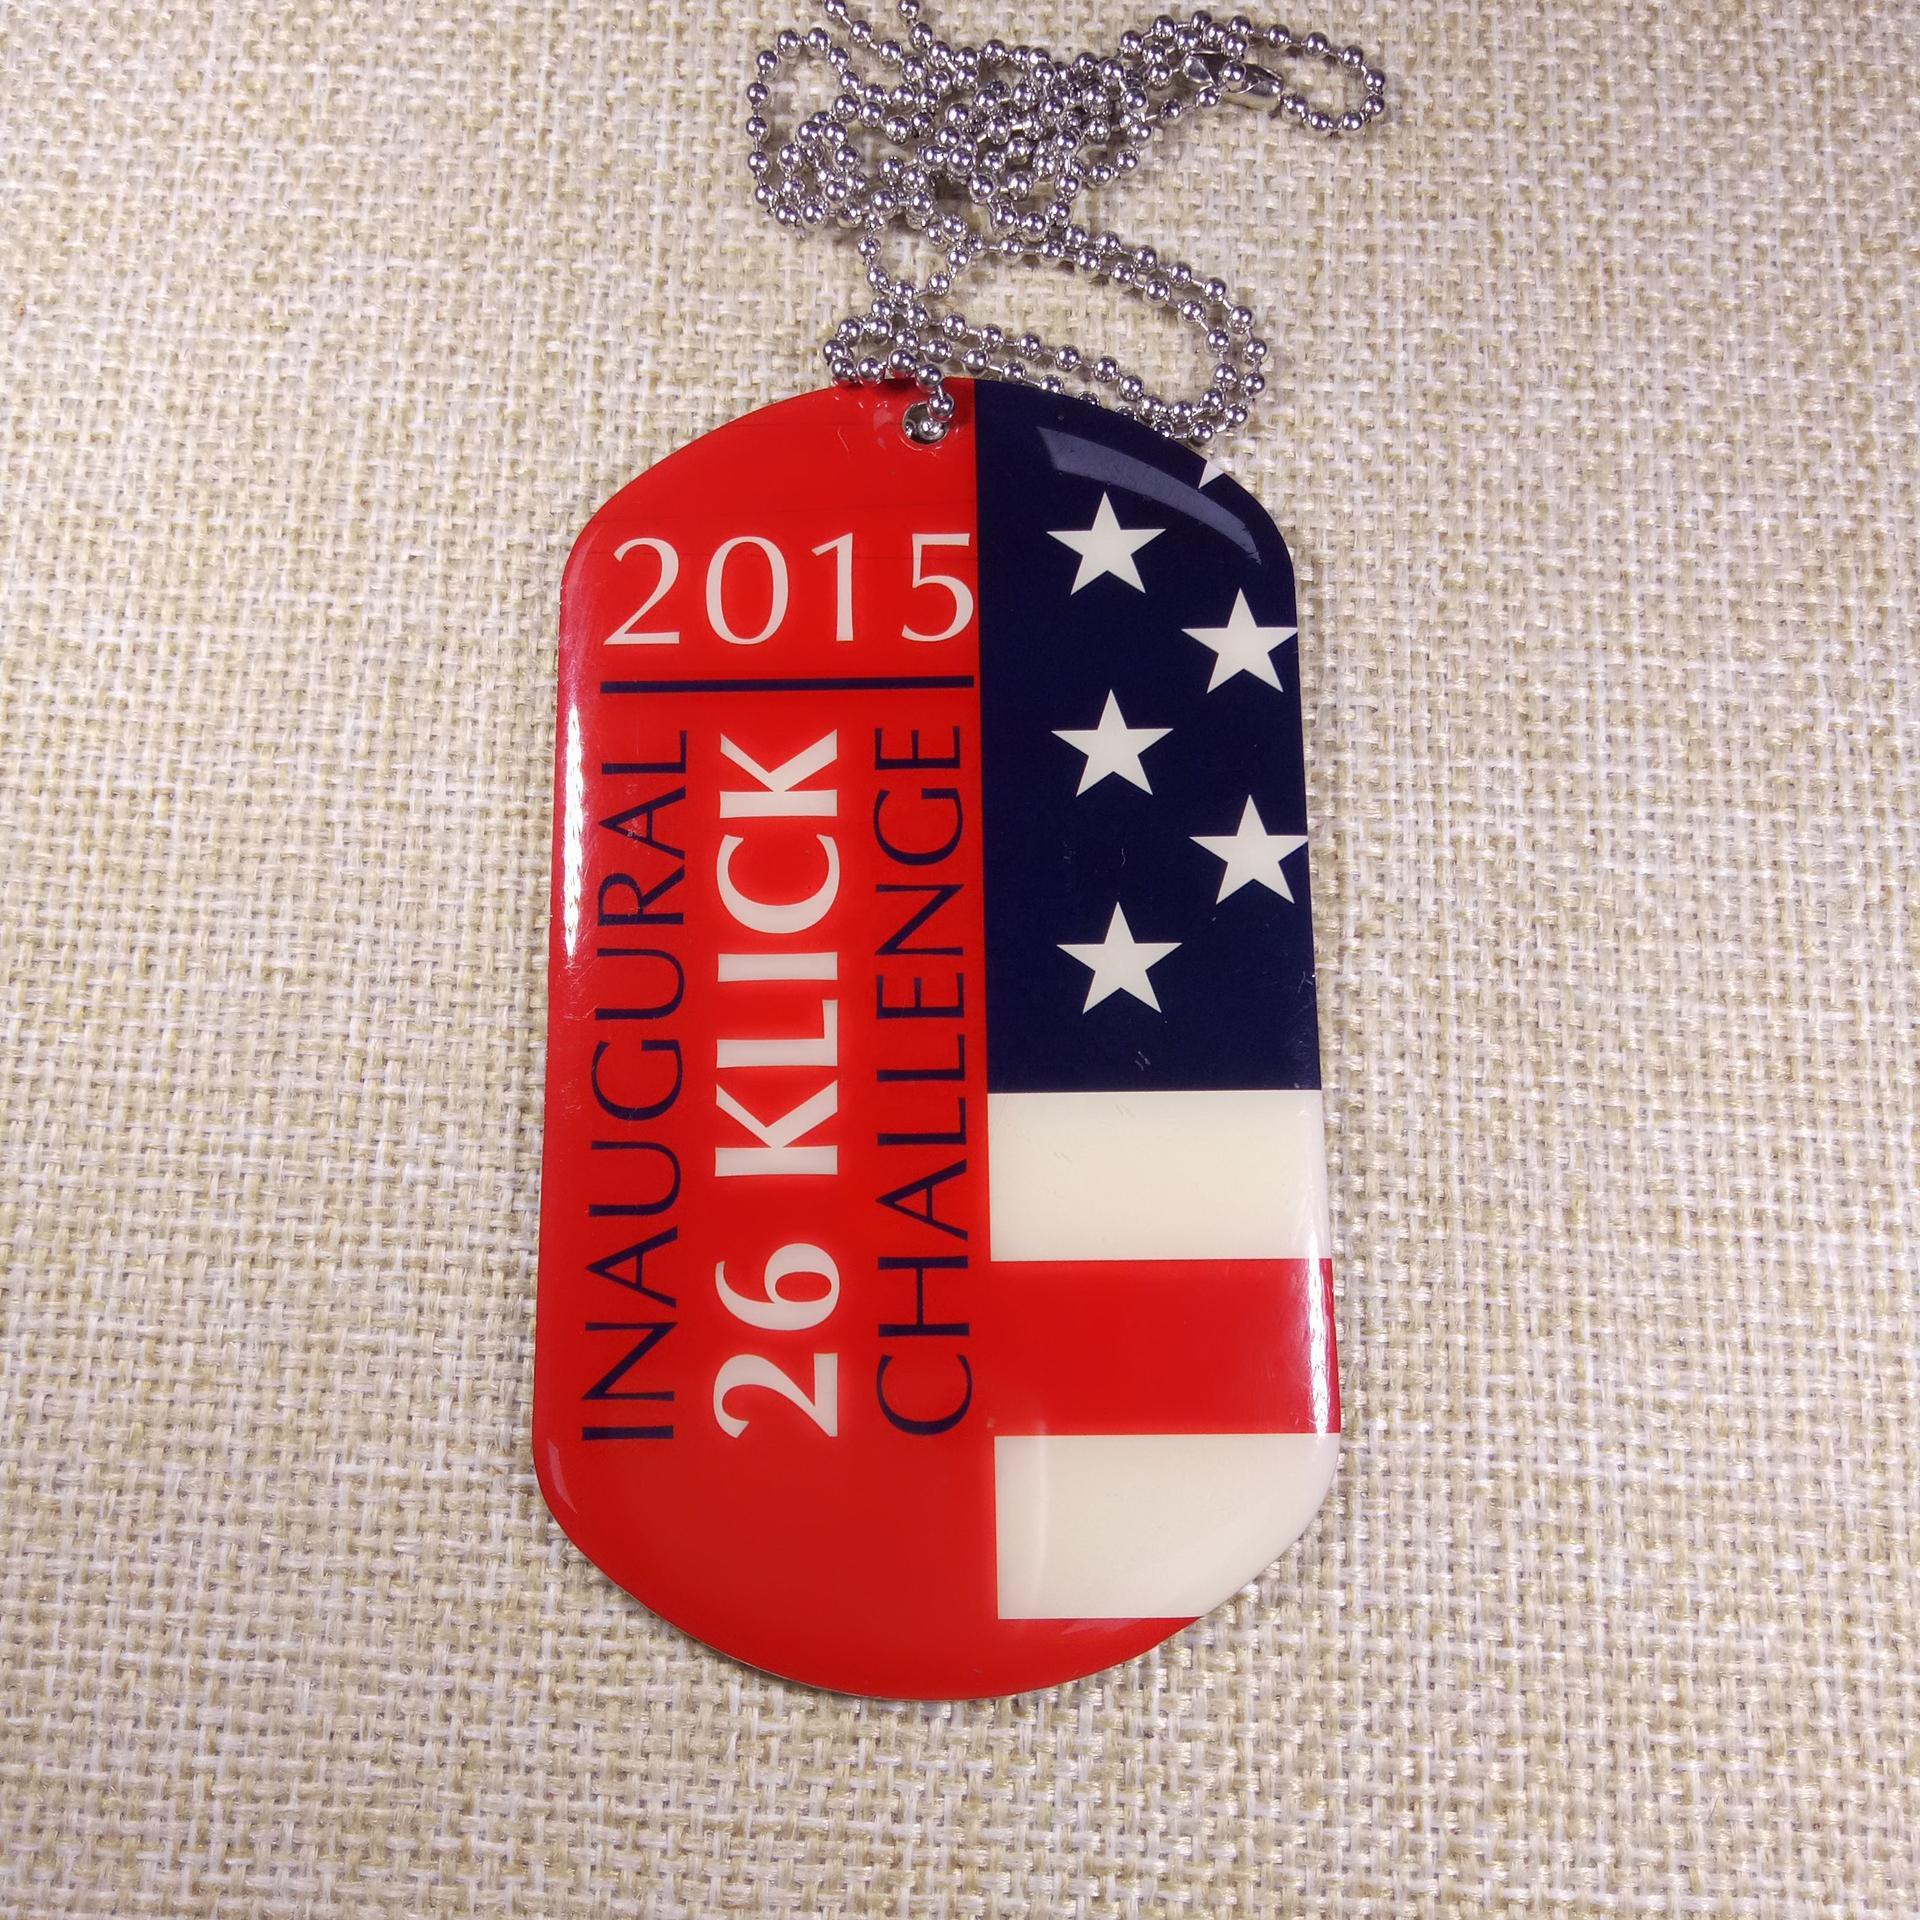 USA flag printed customized popular dog tag with logo printing and epoxy